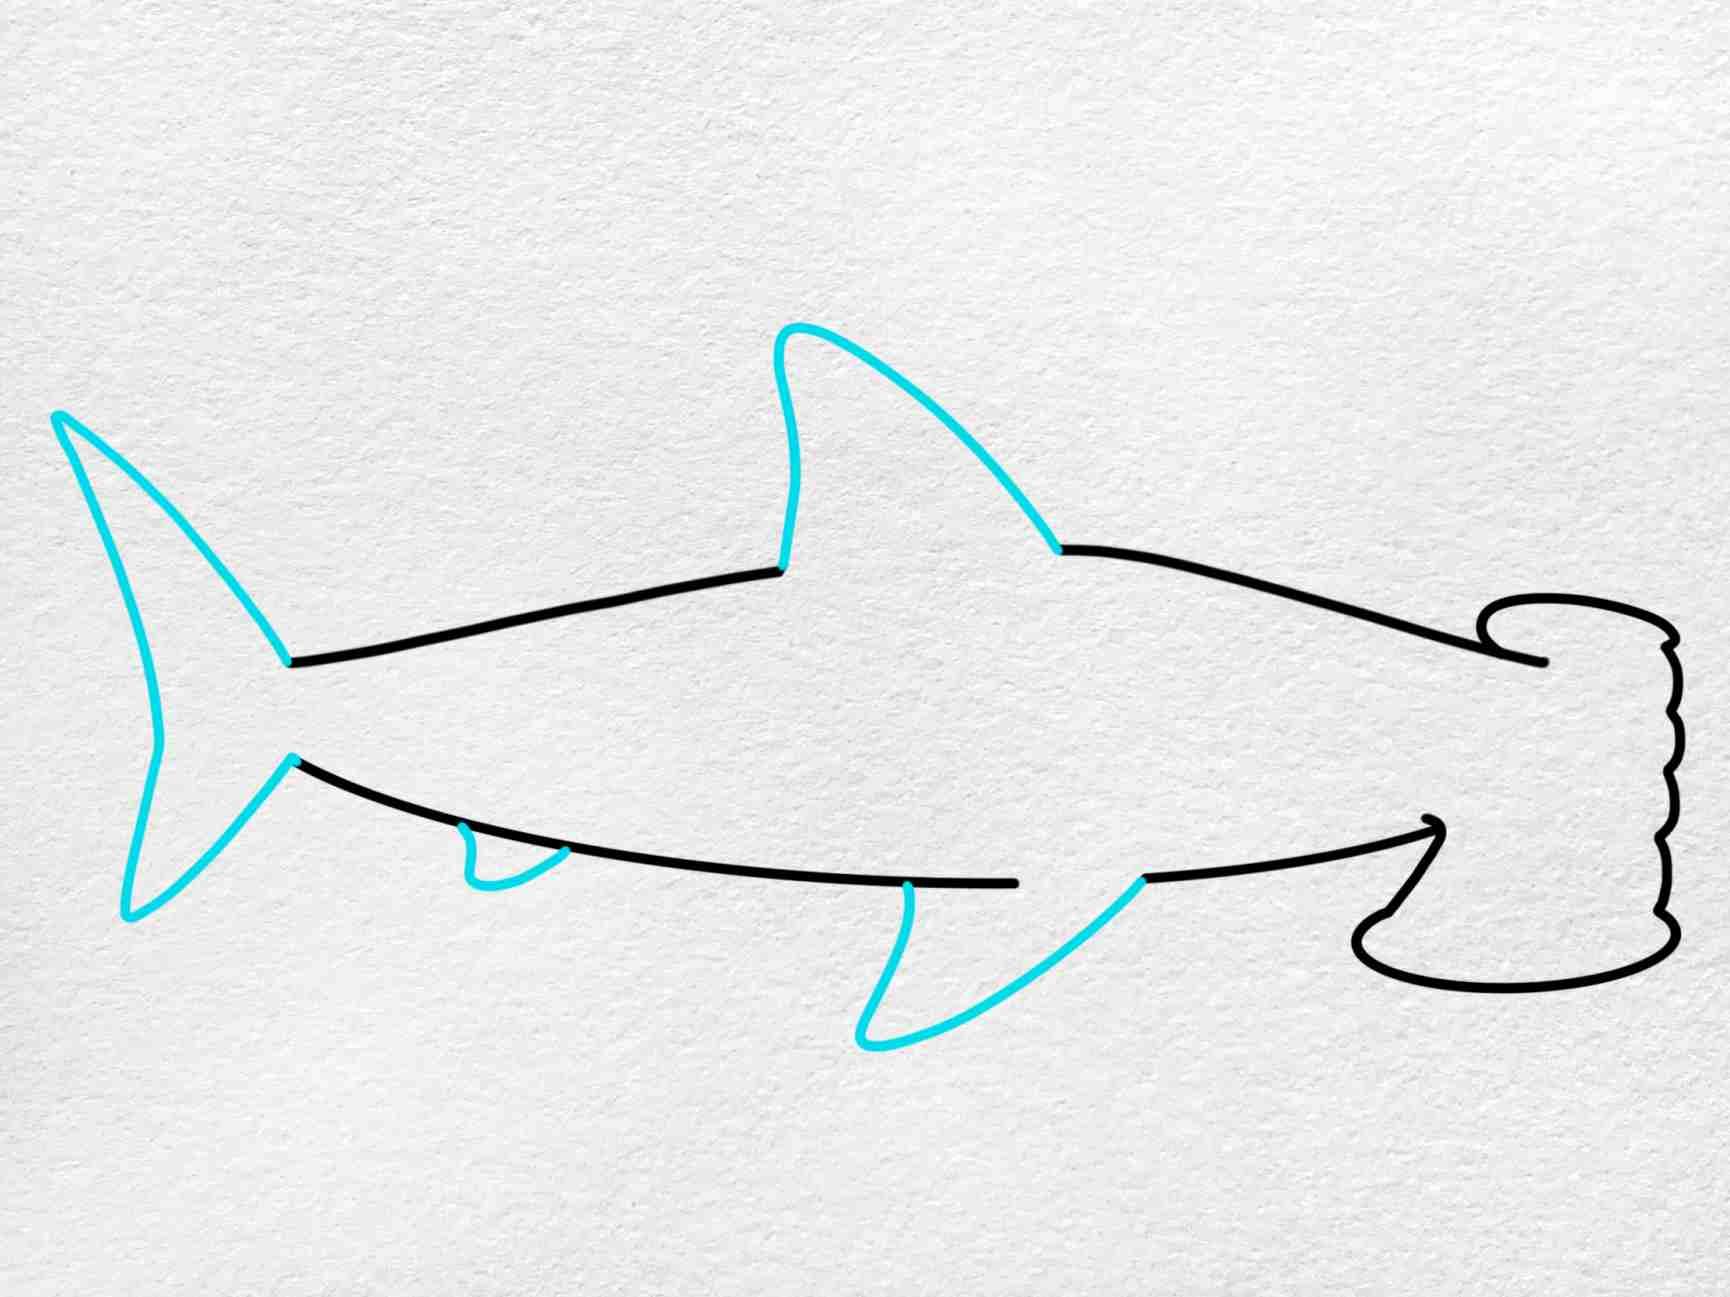 How To Draw A Hammerhead Shark: Step 4